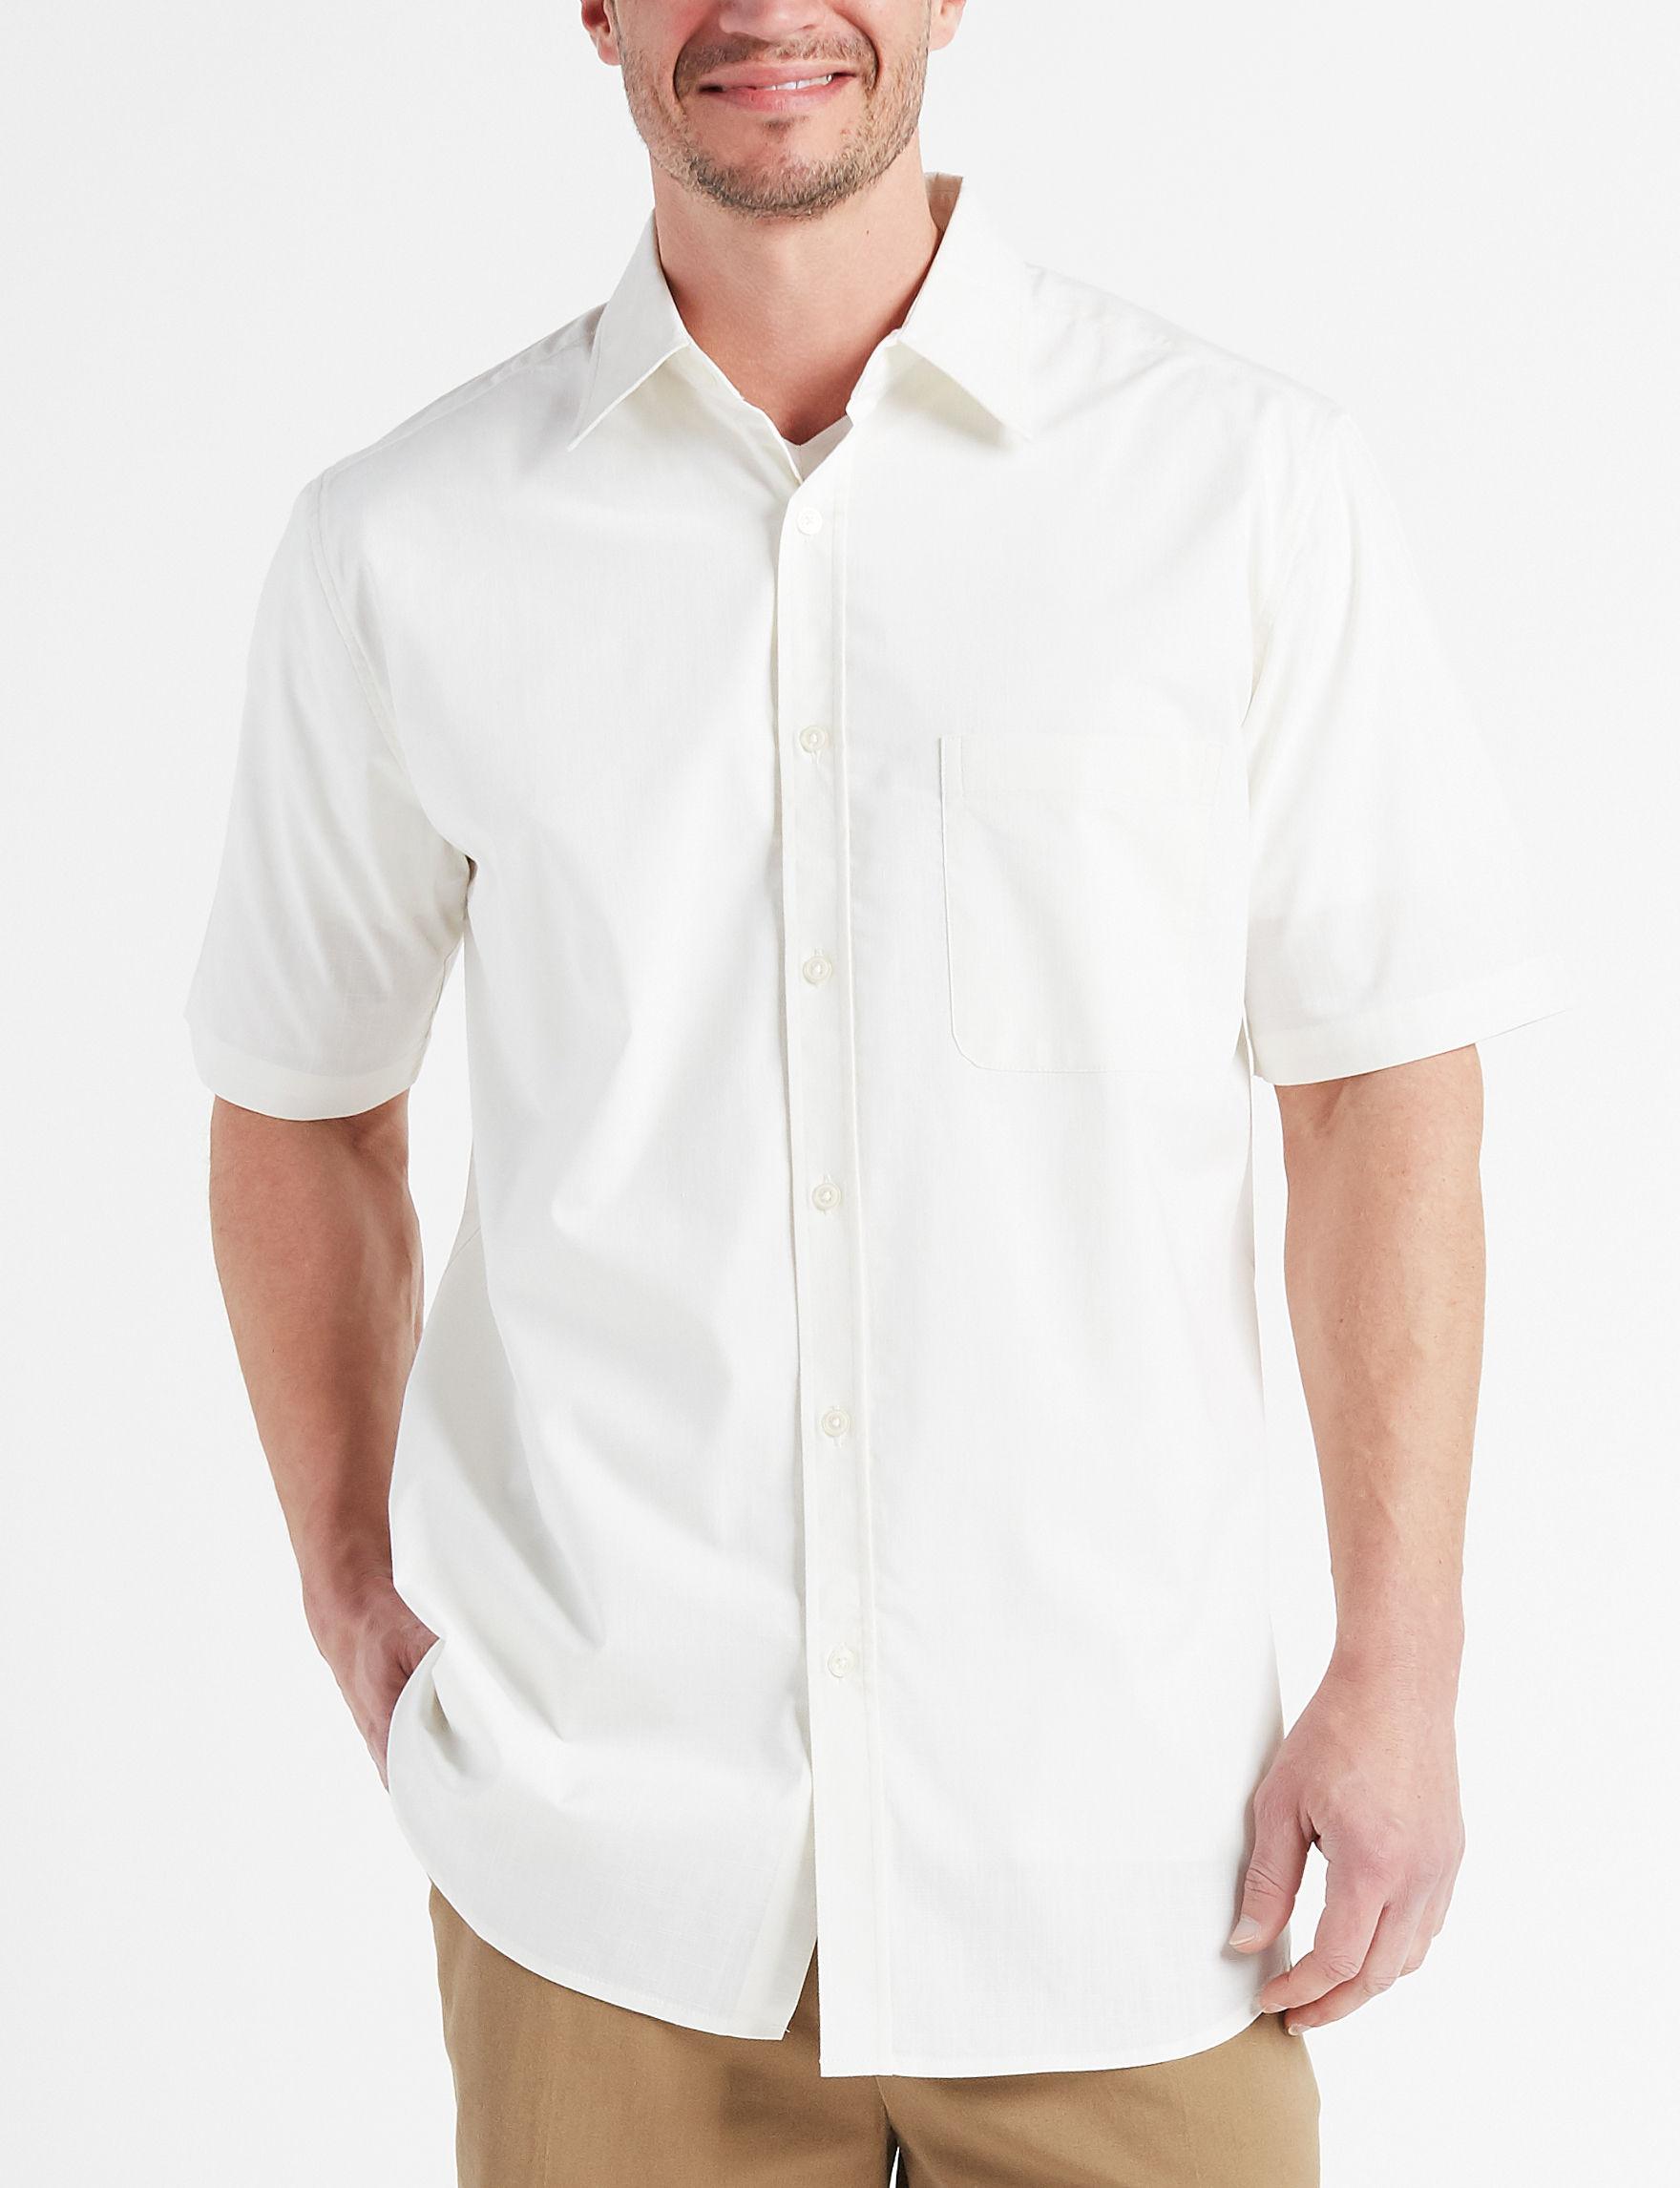 Sun River Cream Casual Button Down Shirts